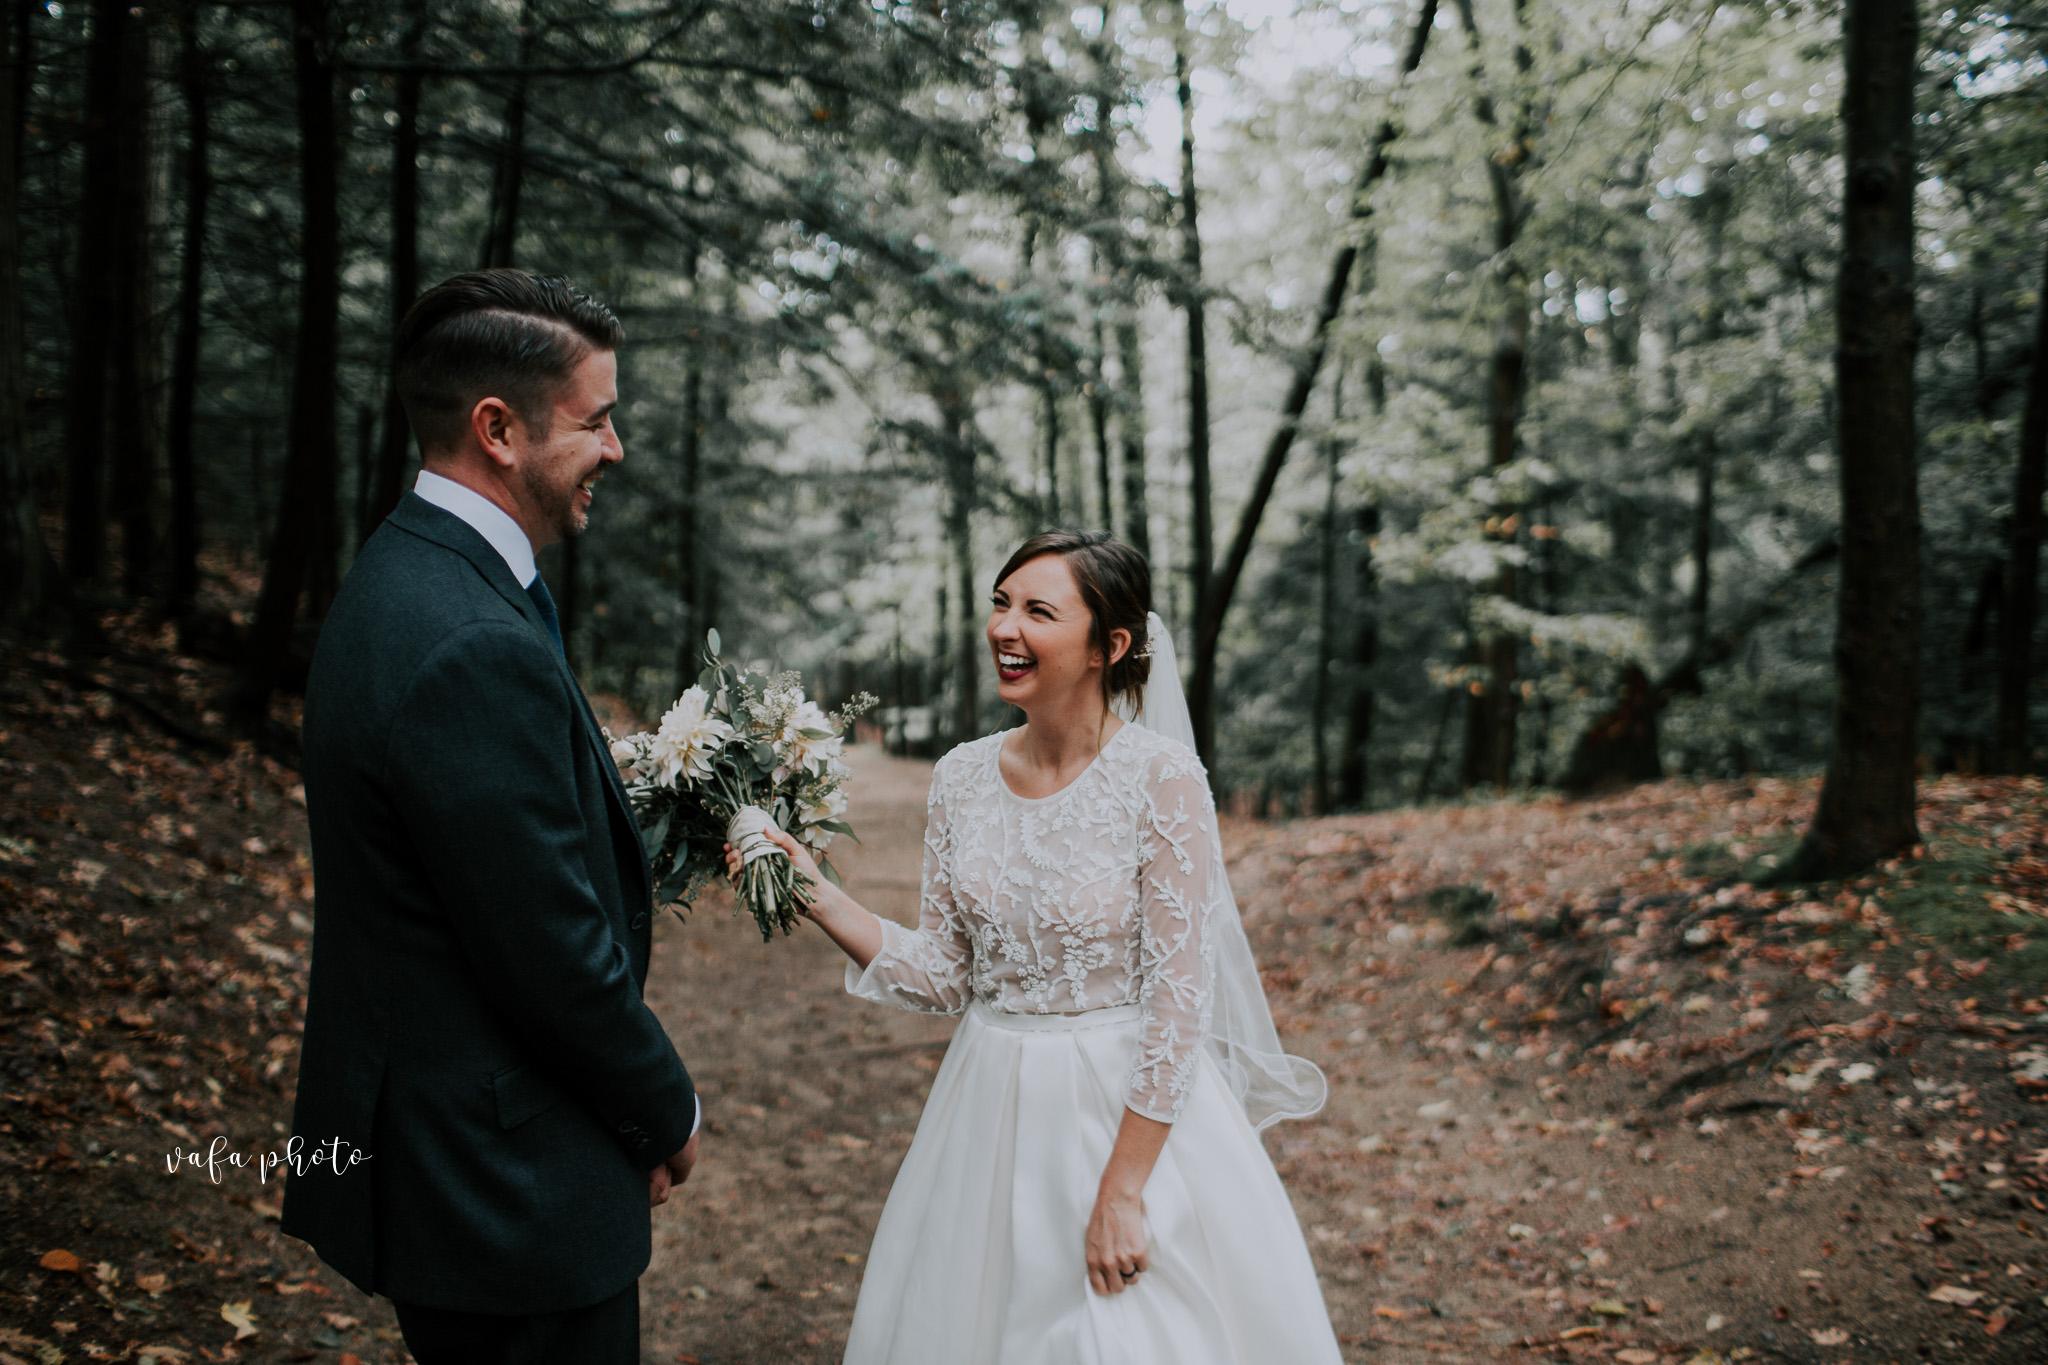 Grand-Rapids-Wedding-Danielle-Brian-Vafa-Photo-282.jpg